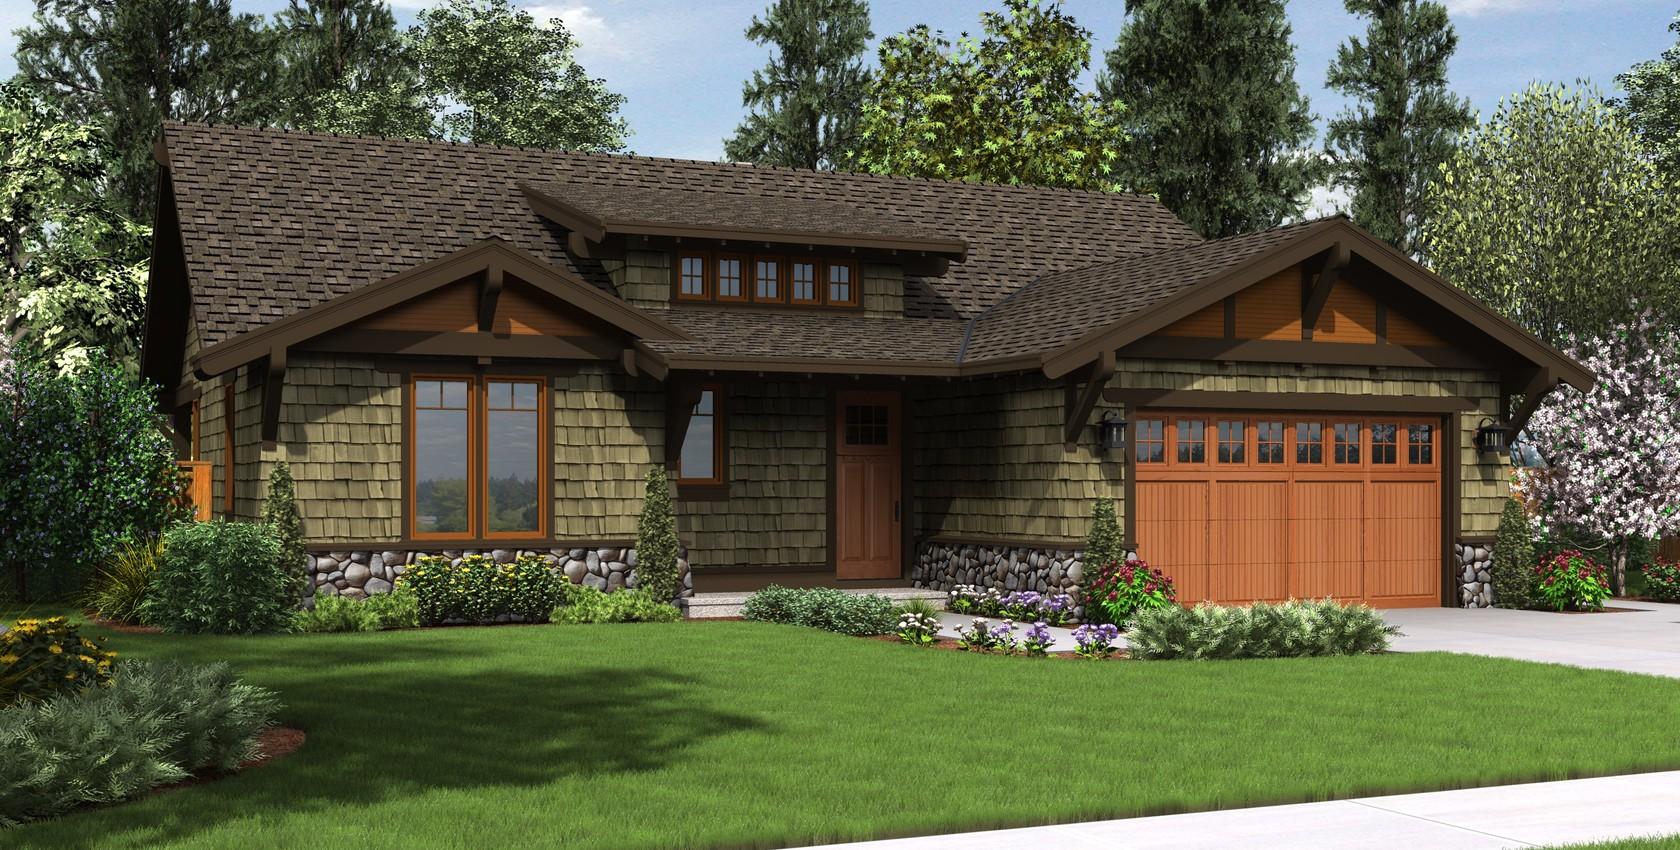 Image for Pasadena-Wonderful compact Craftsman Ranch-4130